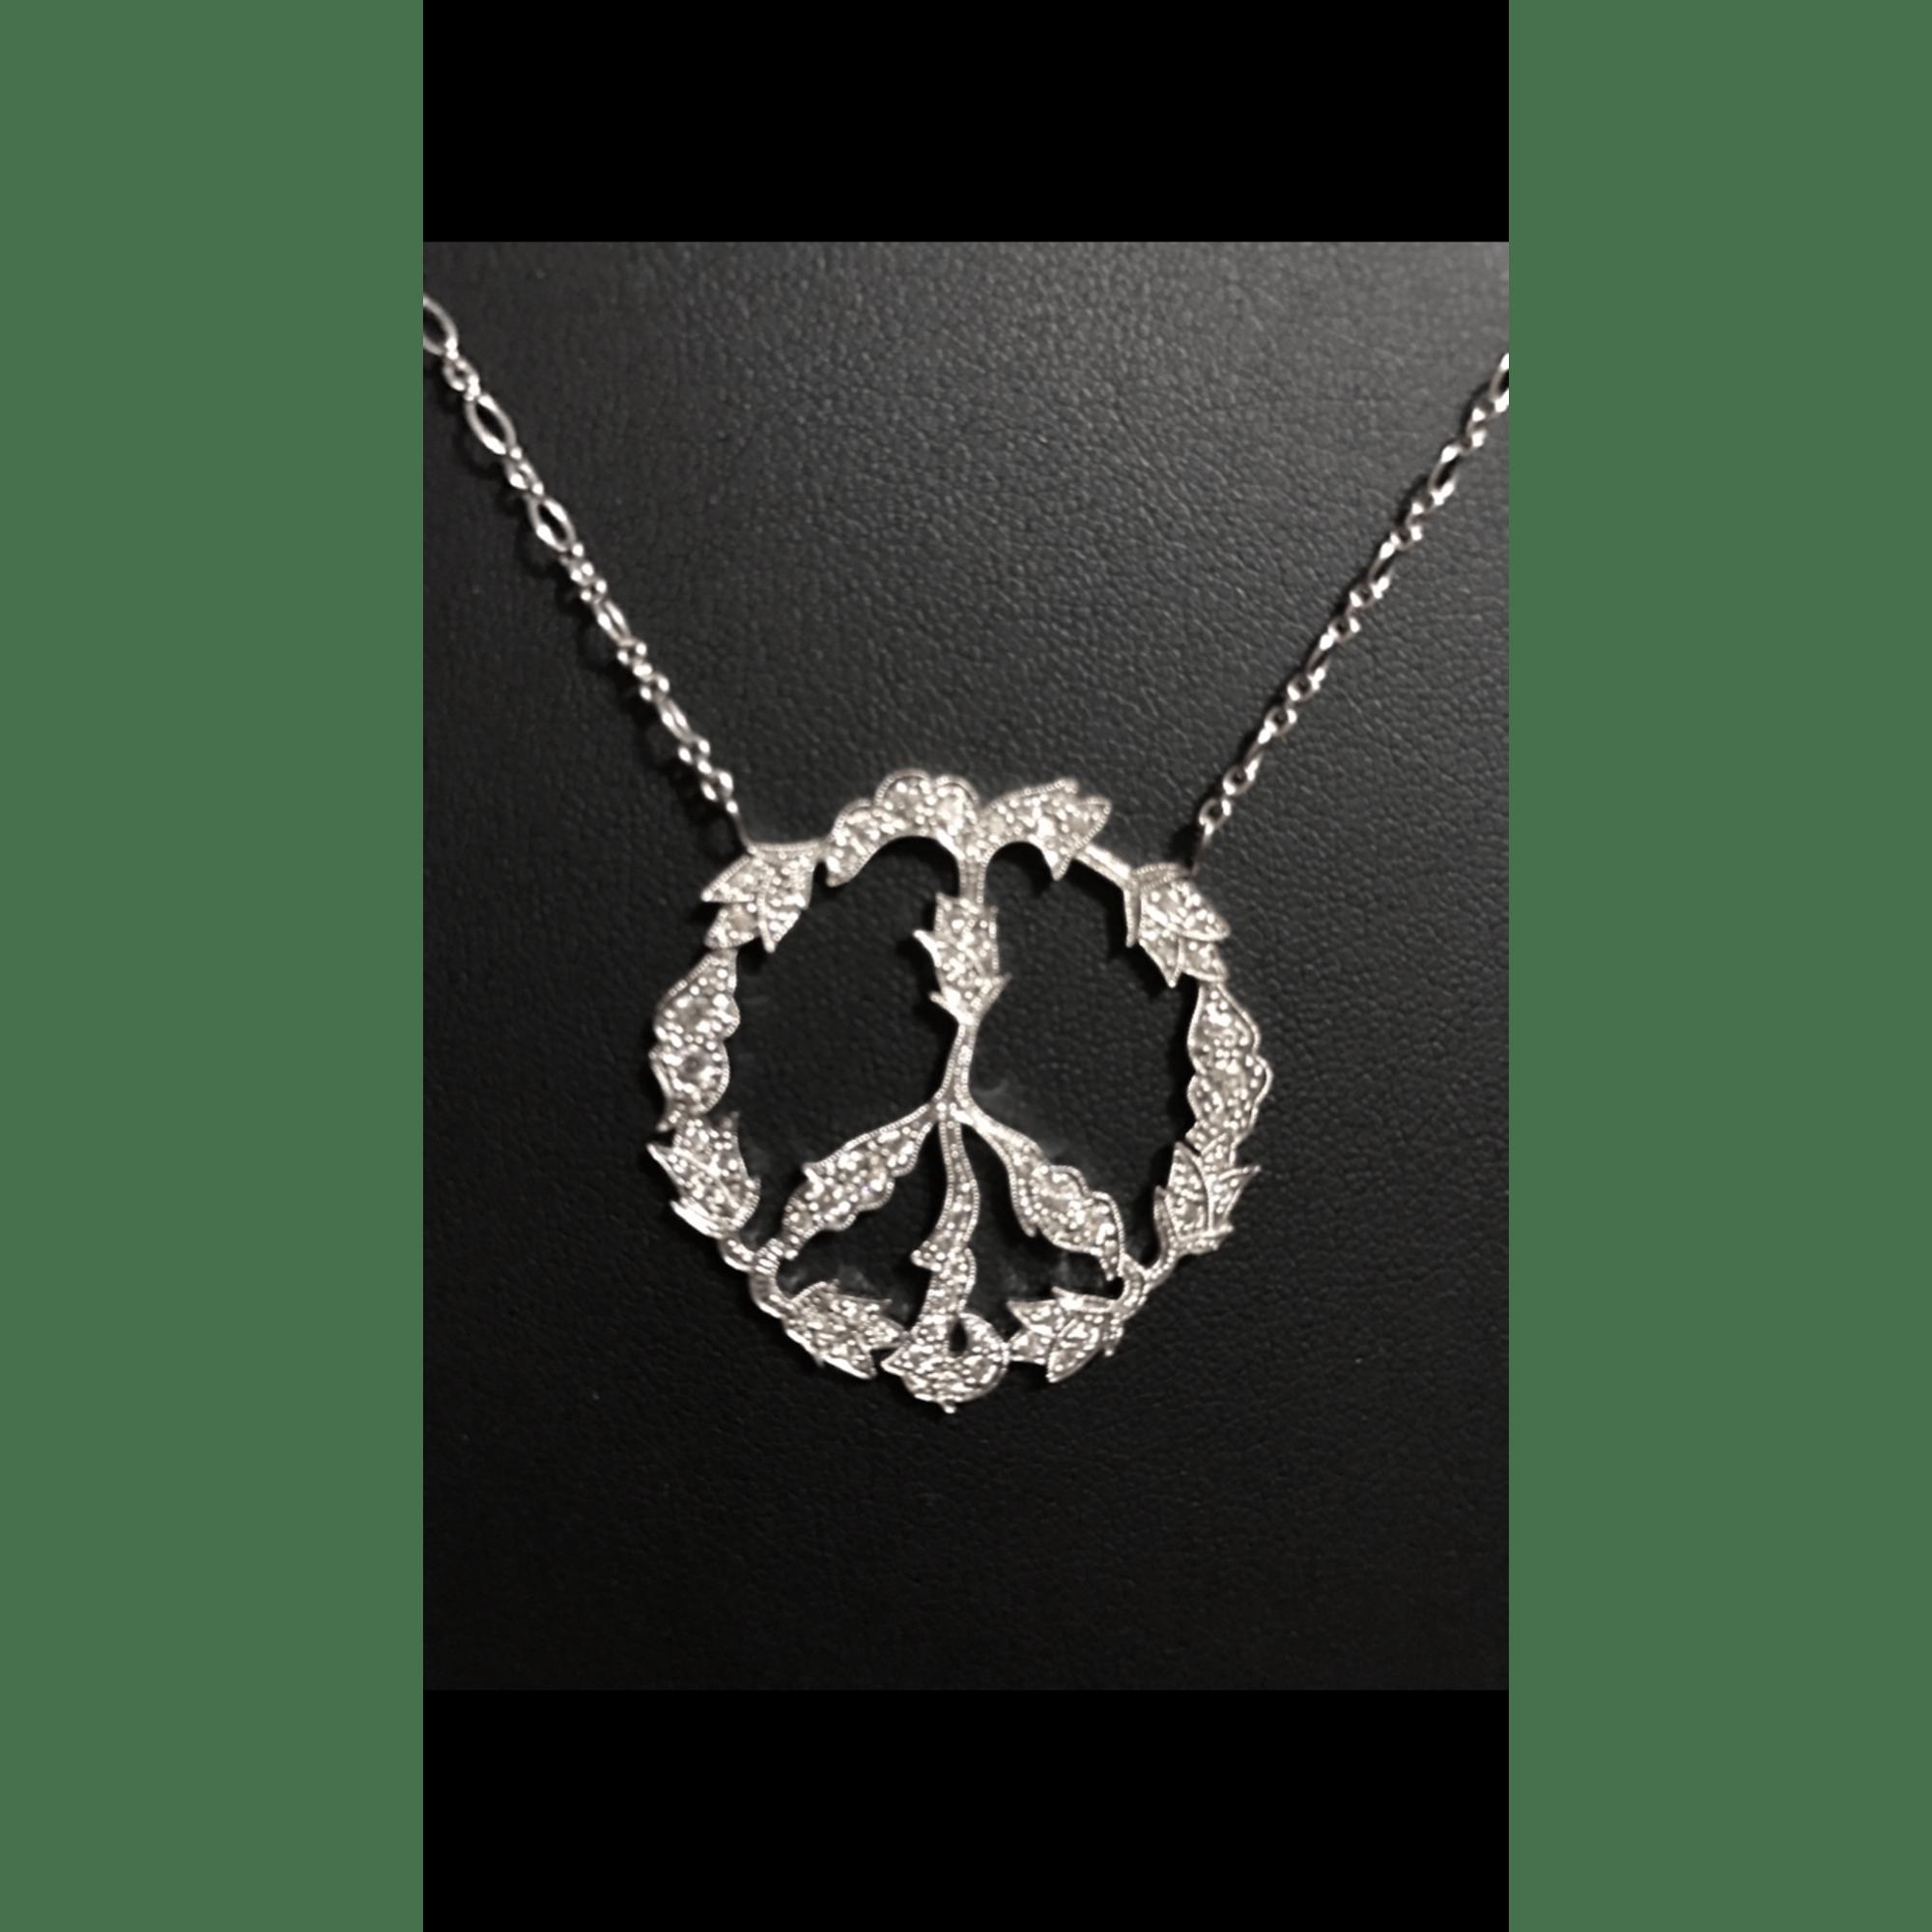 Pendentif, collier pendentif STONE or blanc argent